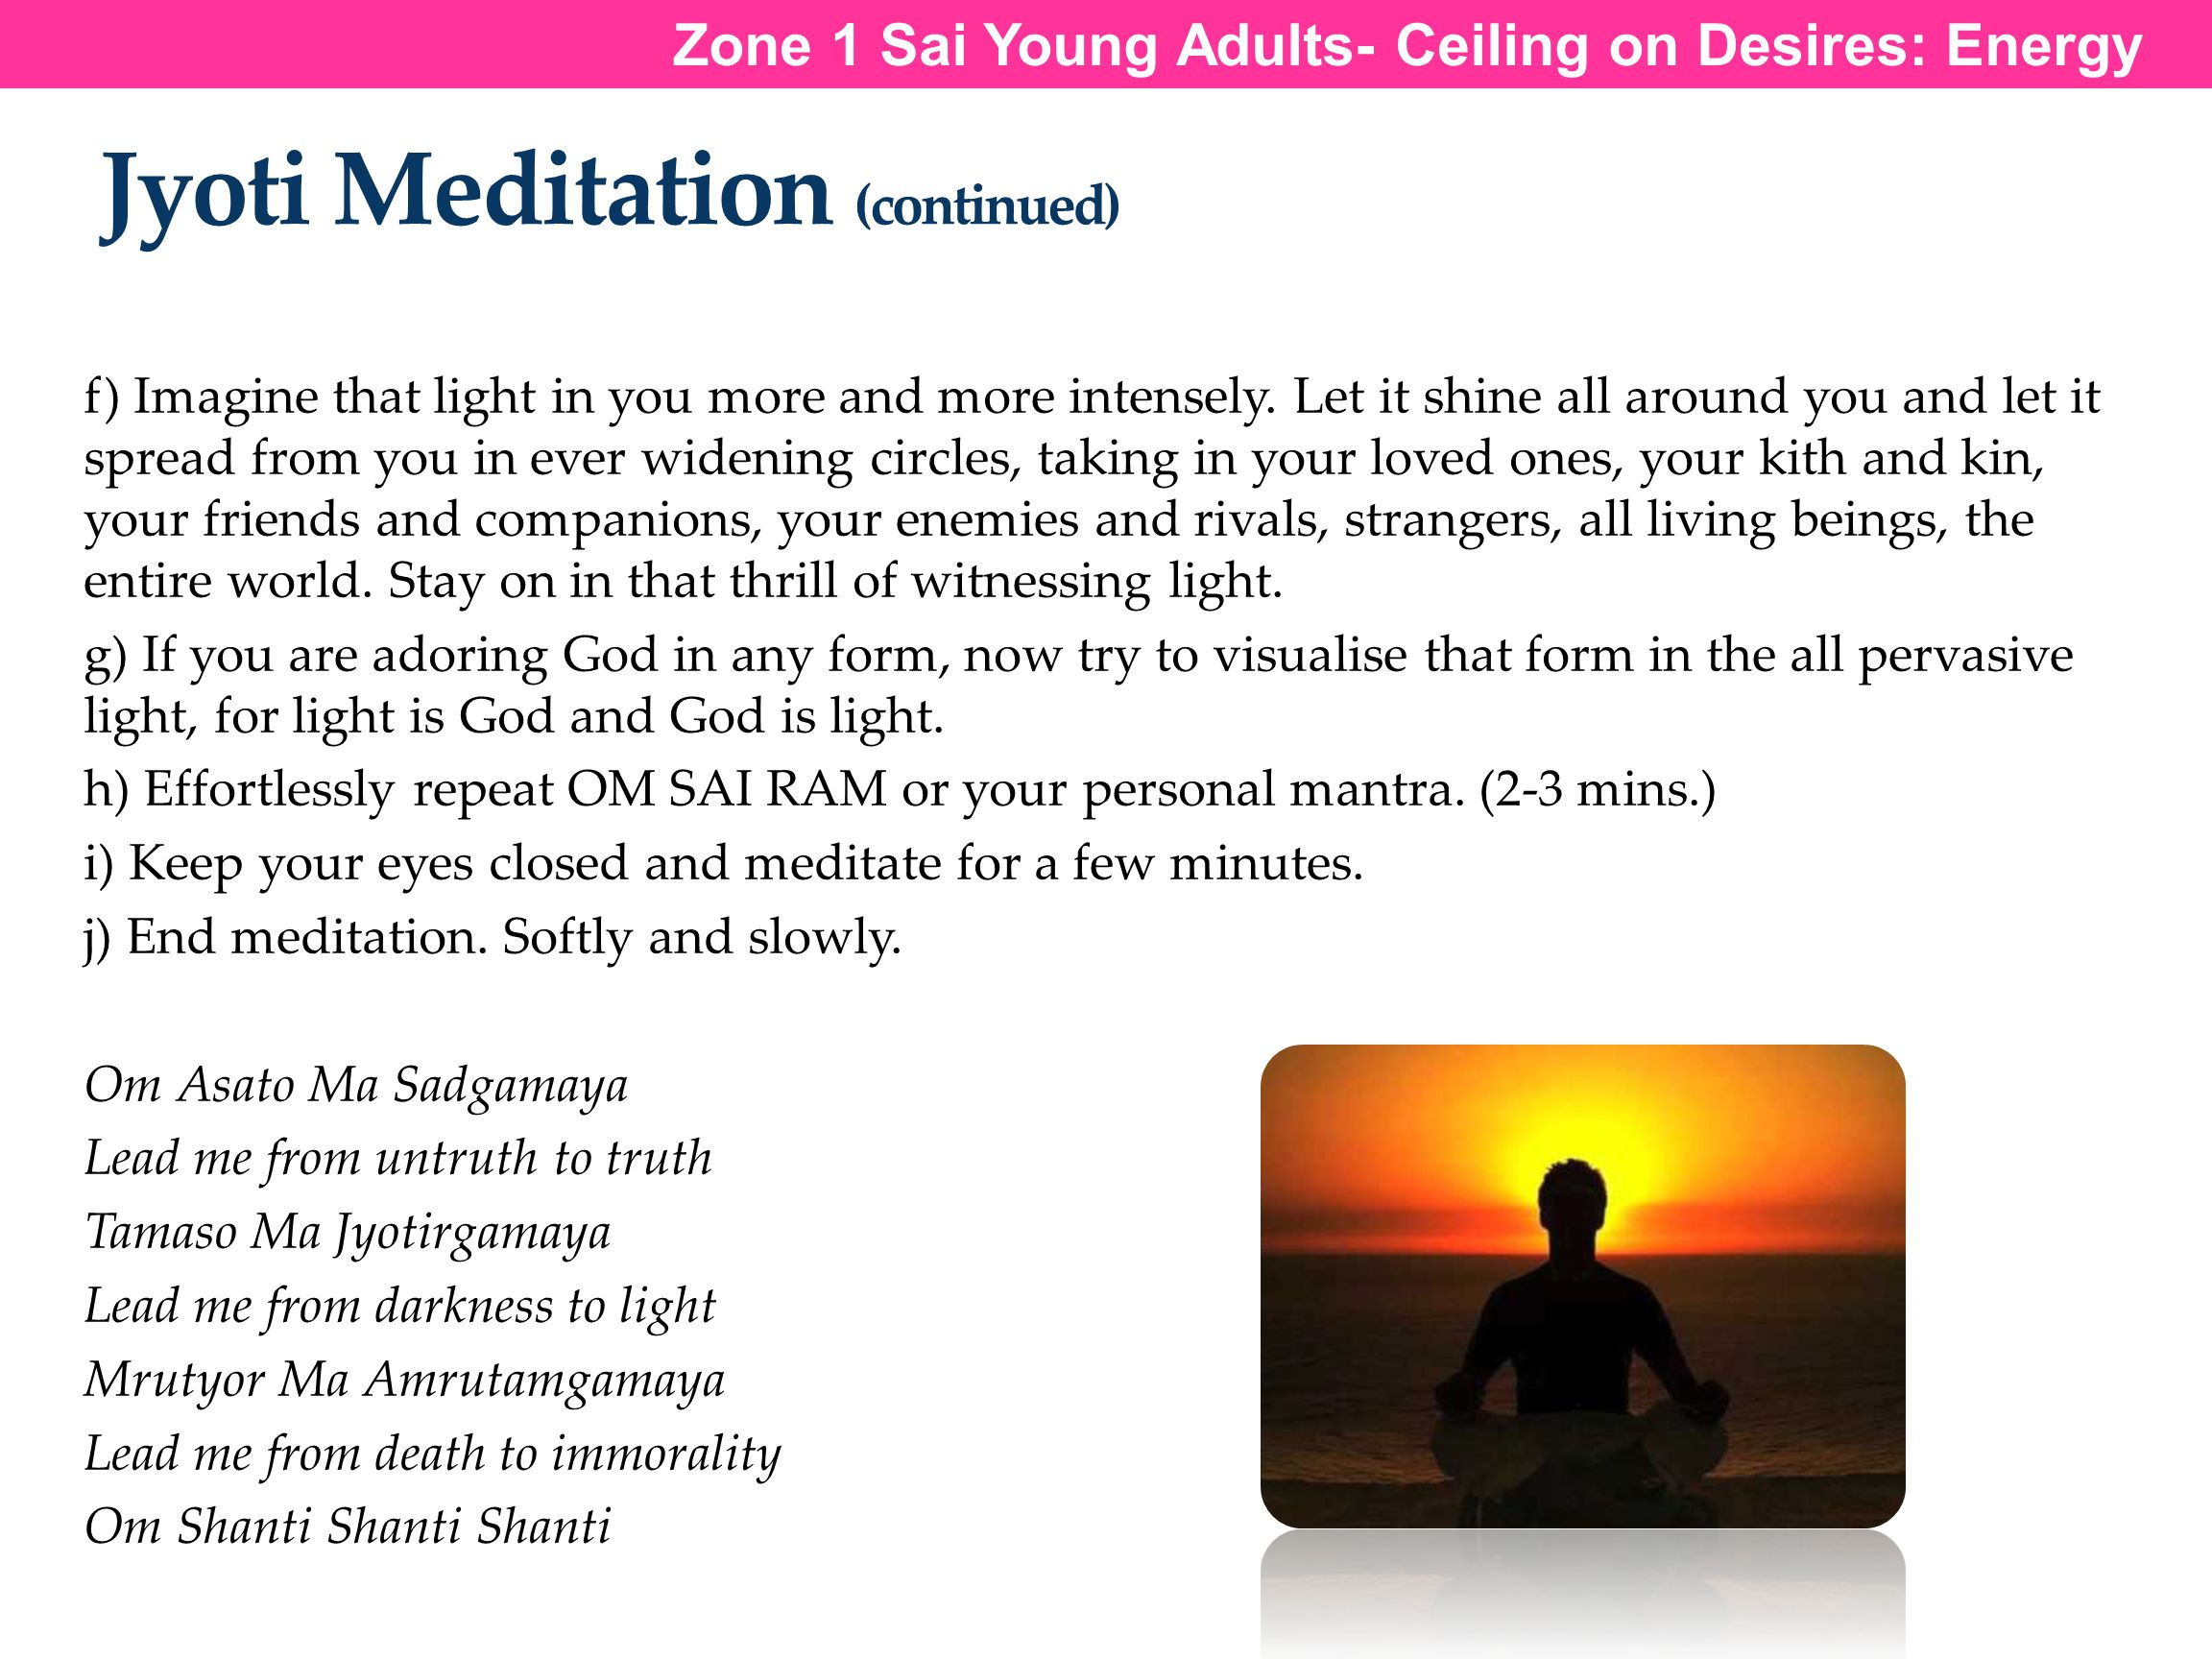 Jyoti Meditation (continued)